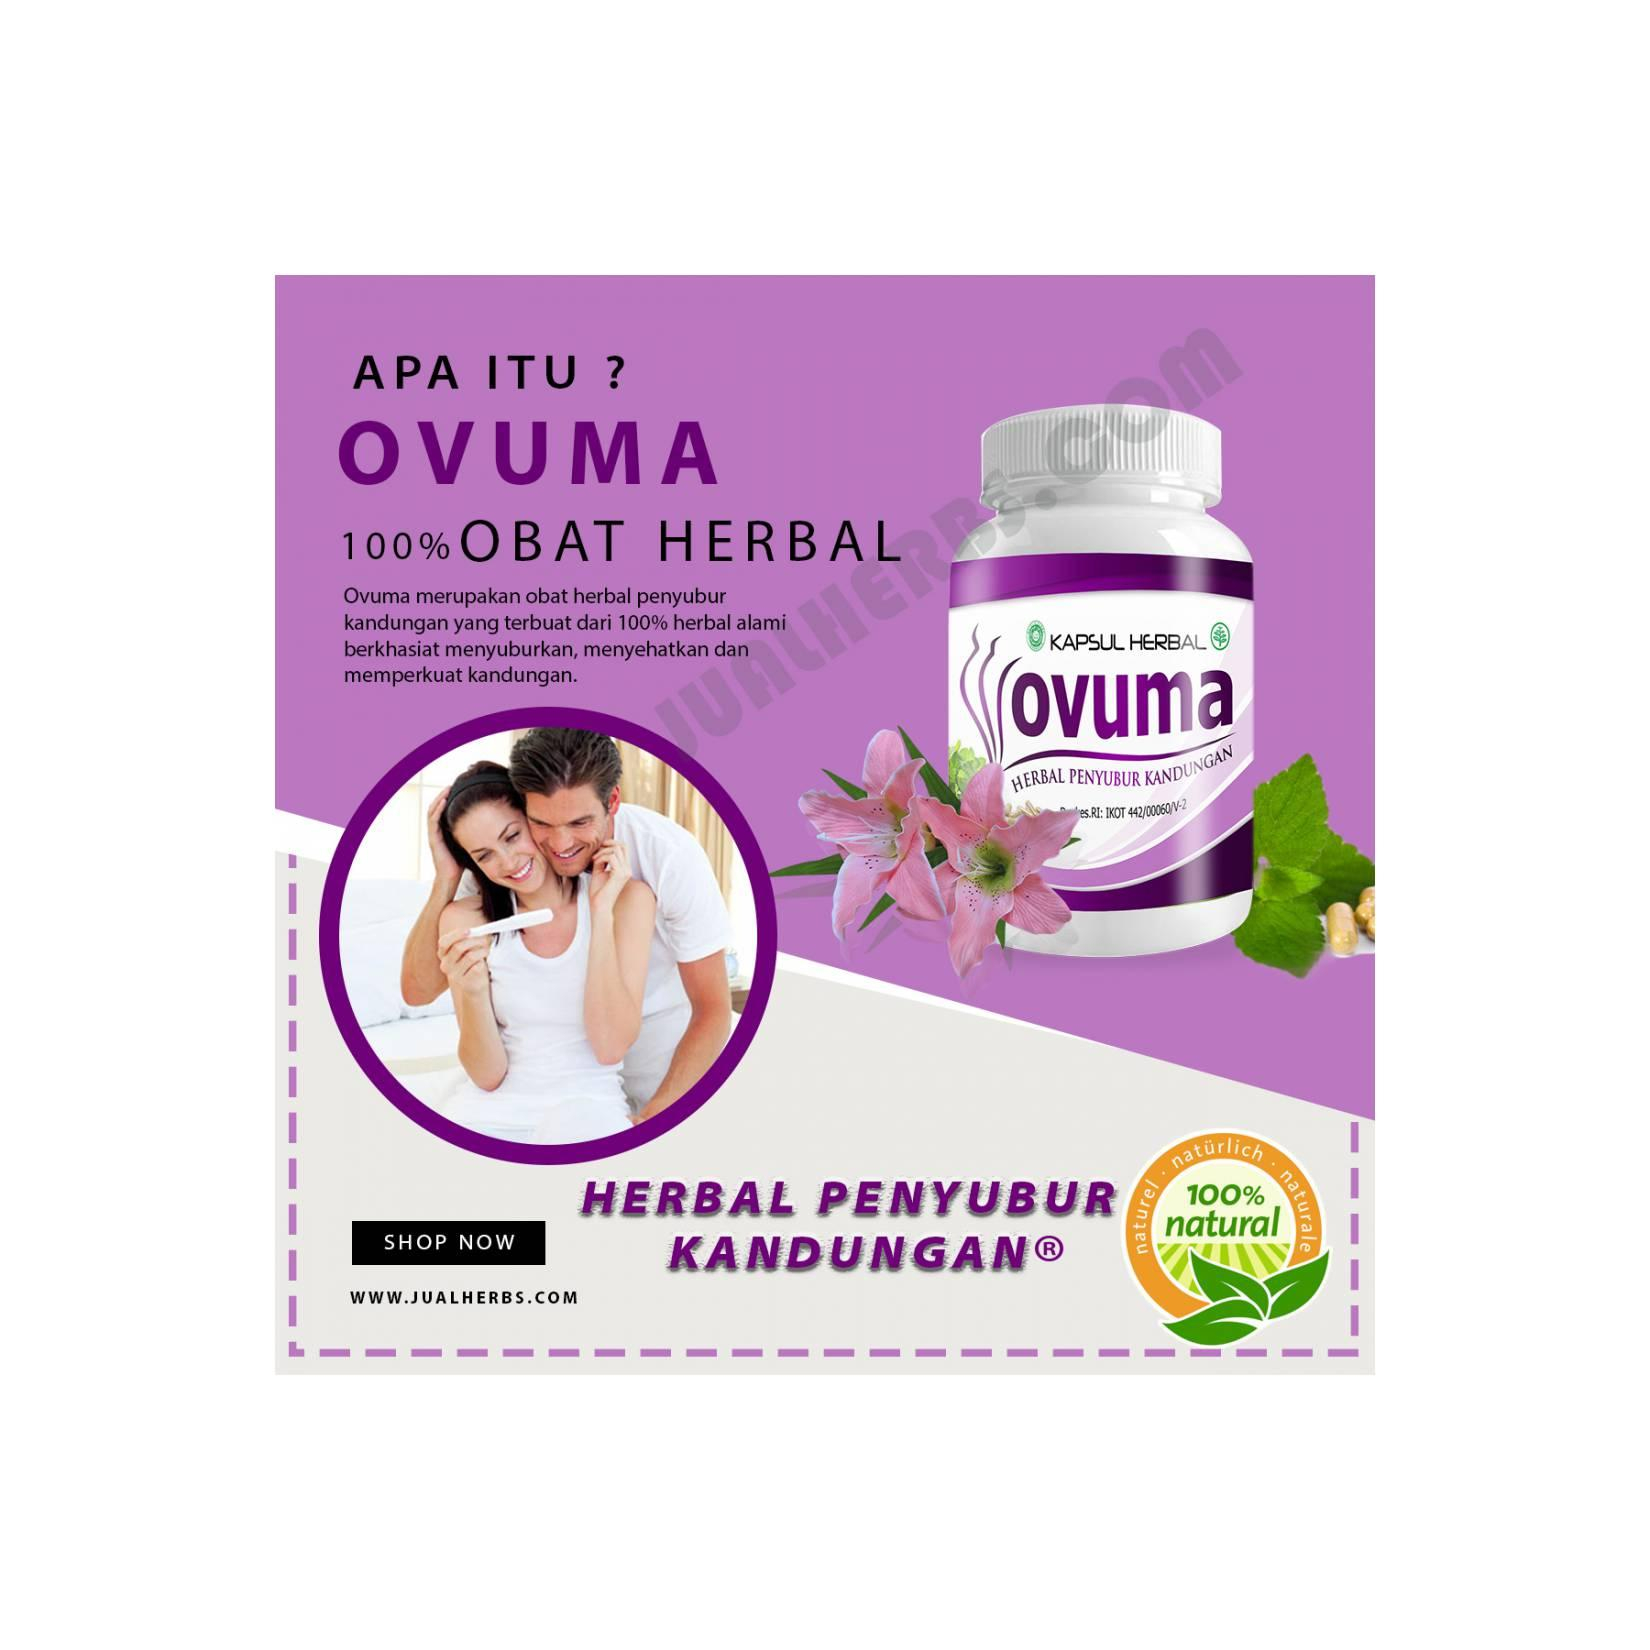 Ovuma - Obat Herbal Penyubur Kandungan 100% Aman